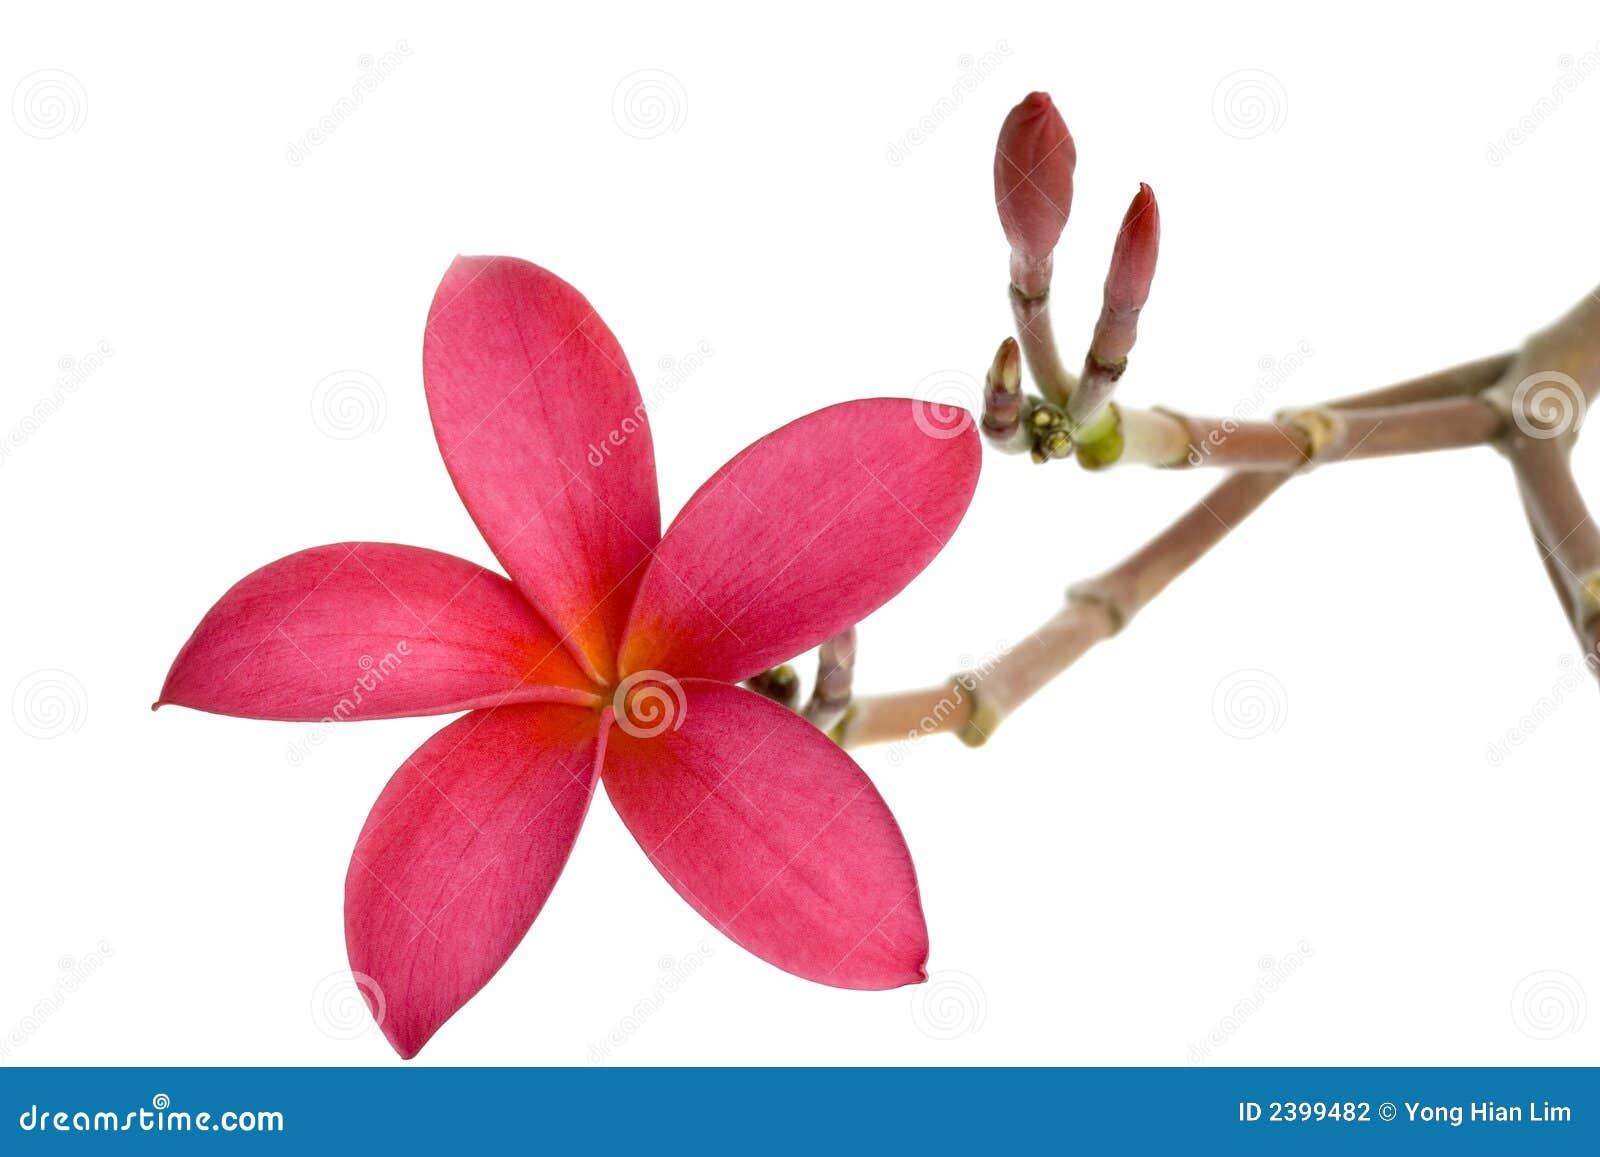 Frangipani spa flowers stock photo image 14654190 - Red Frangipani Flower Stock Photography